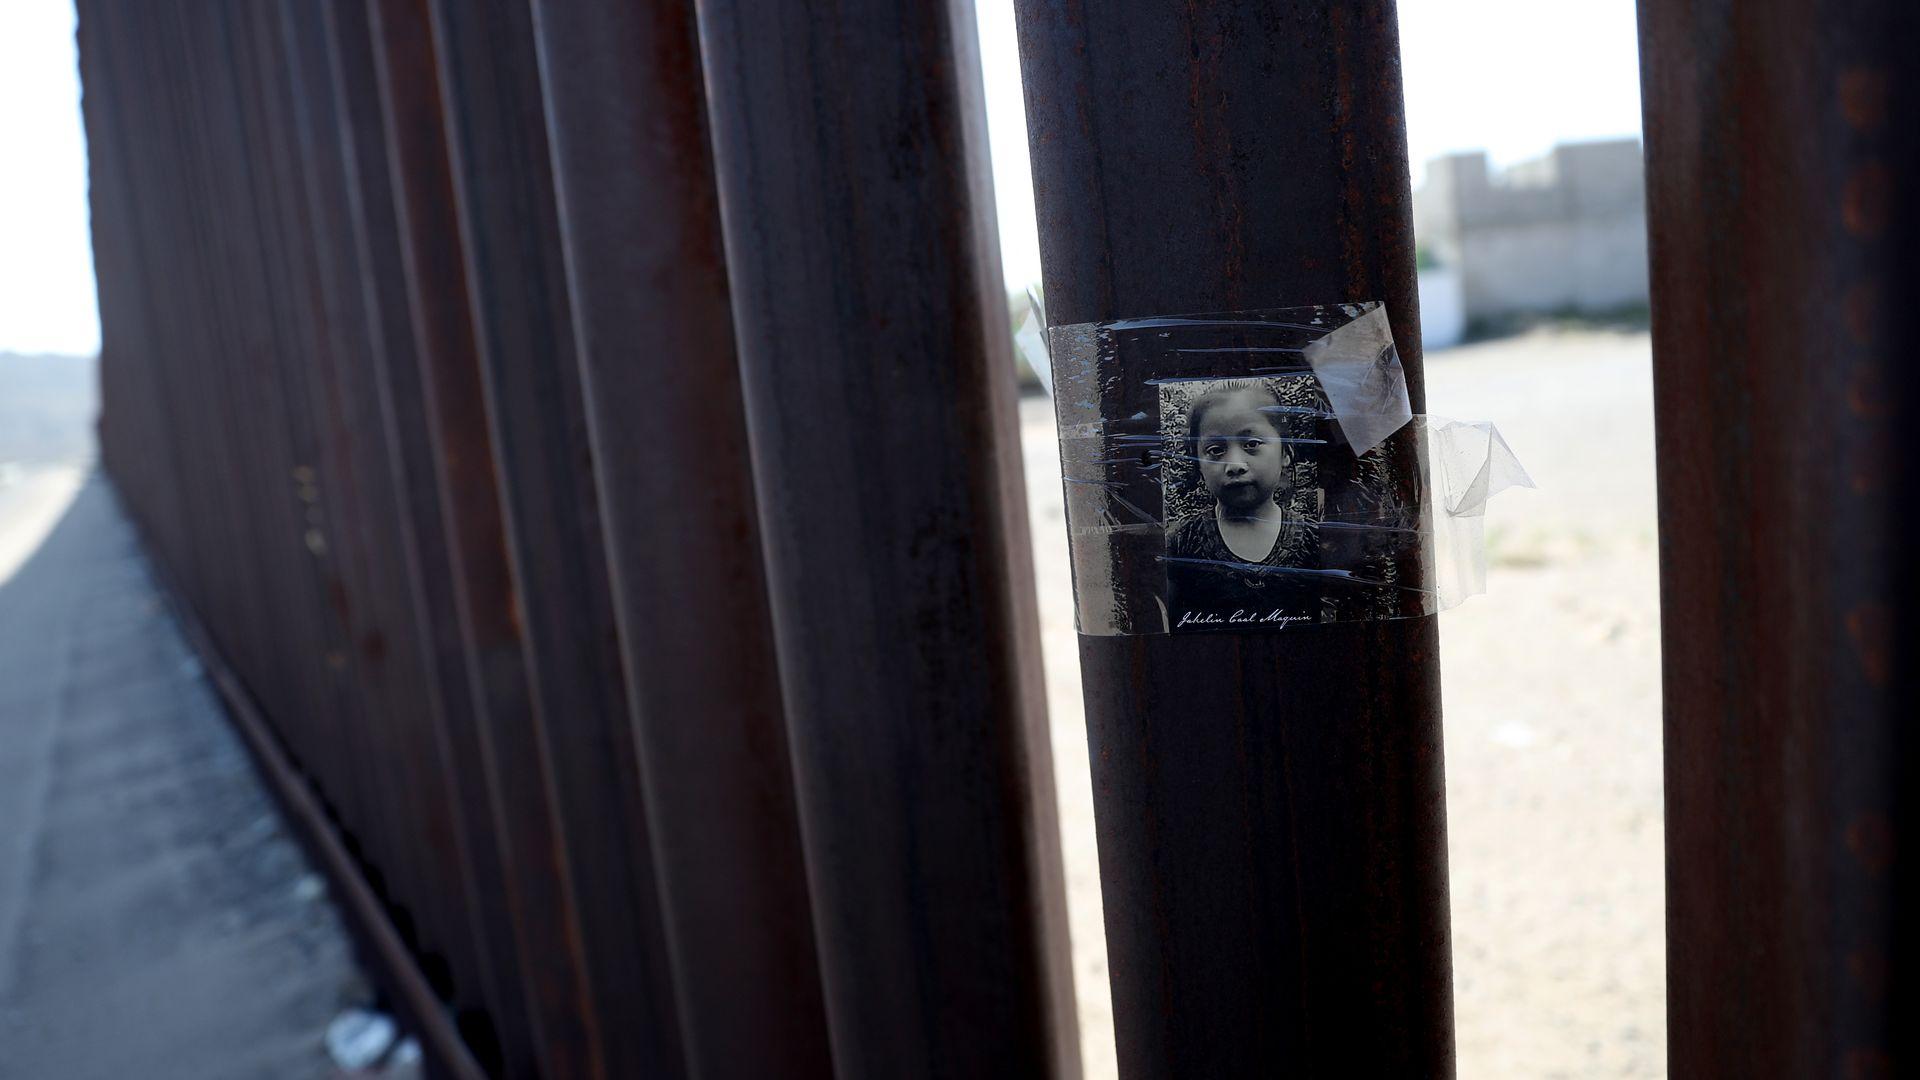 FBI arrests member of militia group that stops migrants at Southern border